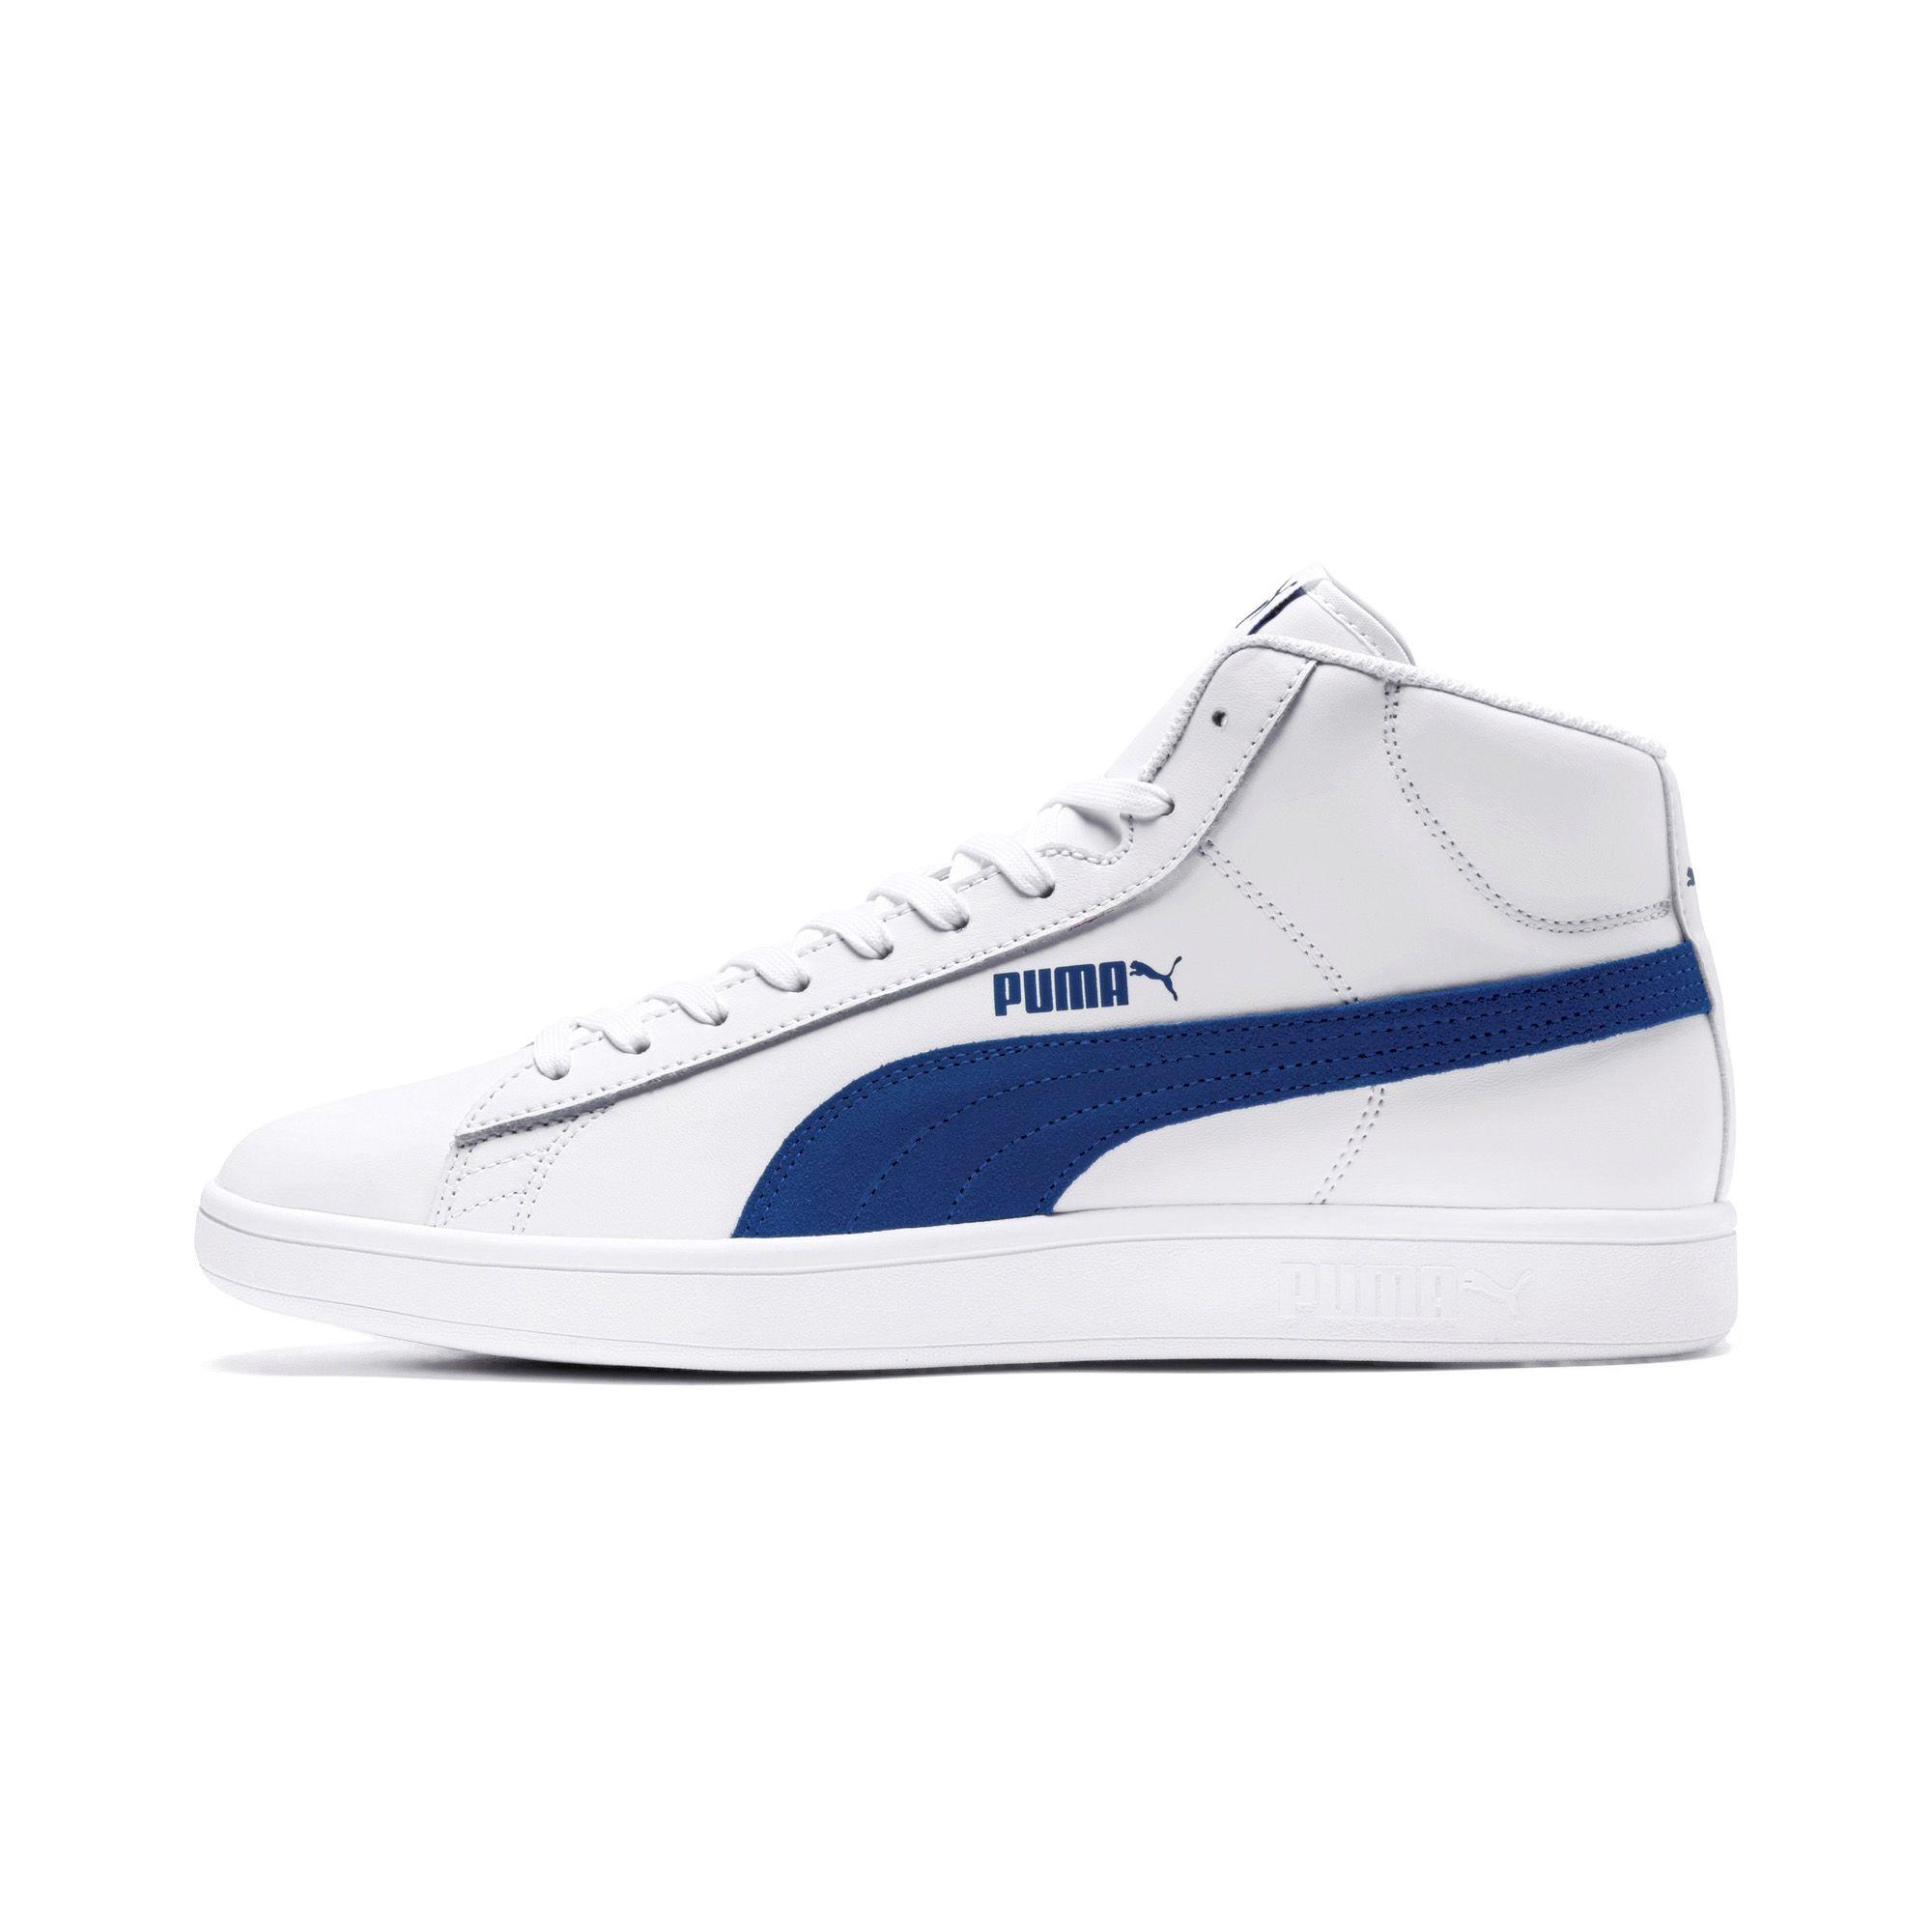 best sneakers ccb41 87593 Puma Scarpe Sneakers Sportive Sportswear Smash V2 L Mid Bianco Caviglia  alta 7 7 sur 8 ...